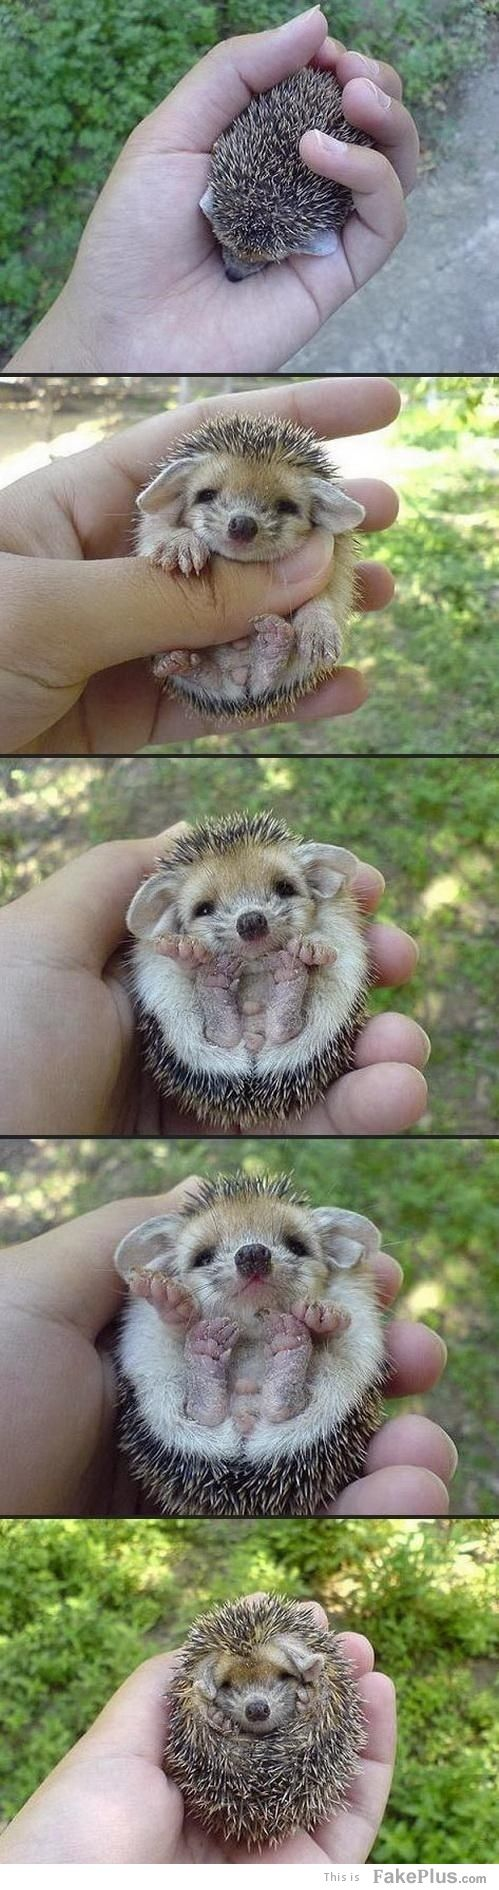 Baby Hedgehog Baby Hedgehog Cute Animals Cute Baby Animals